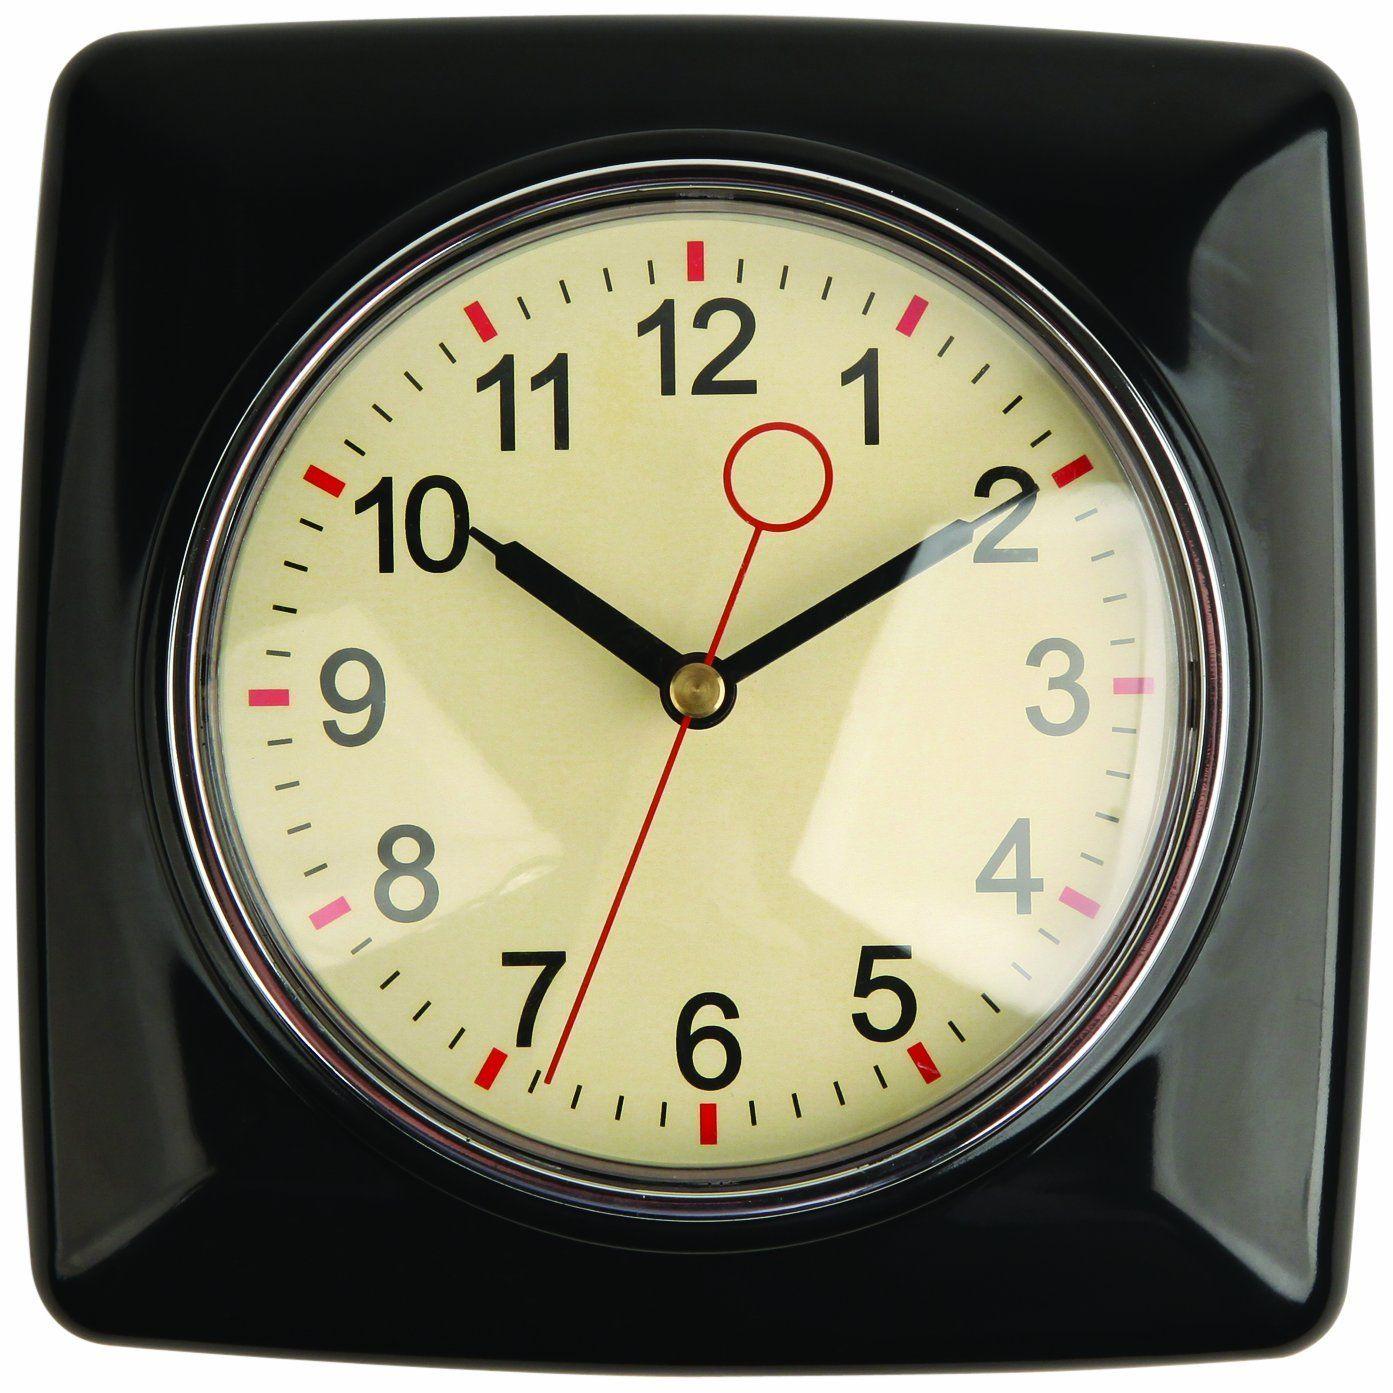 Amazon.com - Kikkerland Retro Kitchen Wall Clock, Black - Wall Clock ...